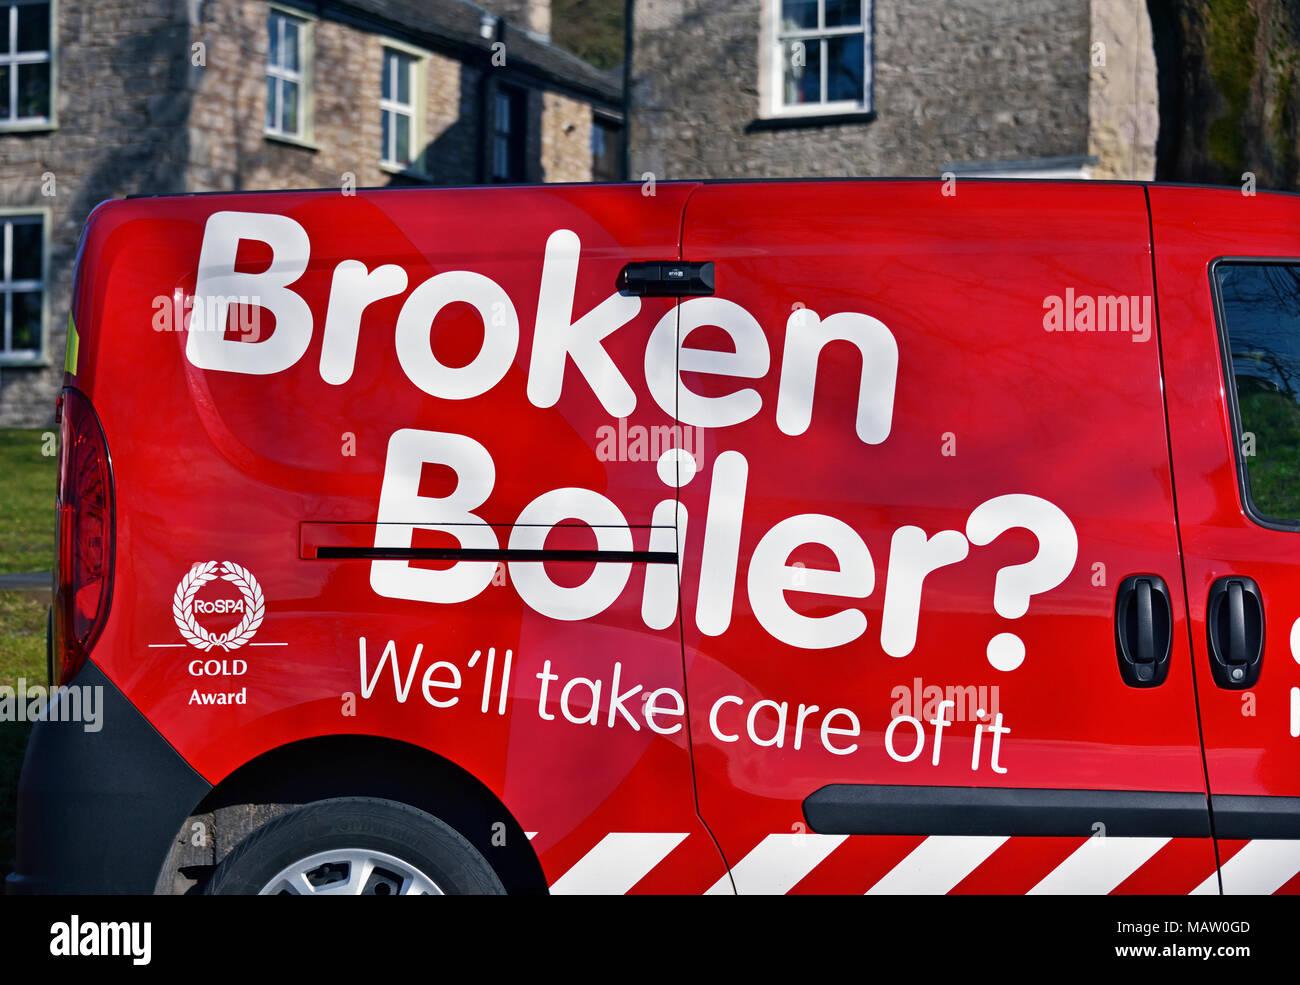 'Broken Boiler? We'll take care of it.' logo on side of van. Kendal, Cumbria, England, United Kingdom, Europe. - Stock Image